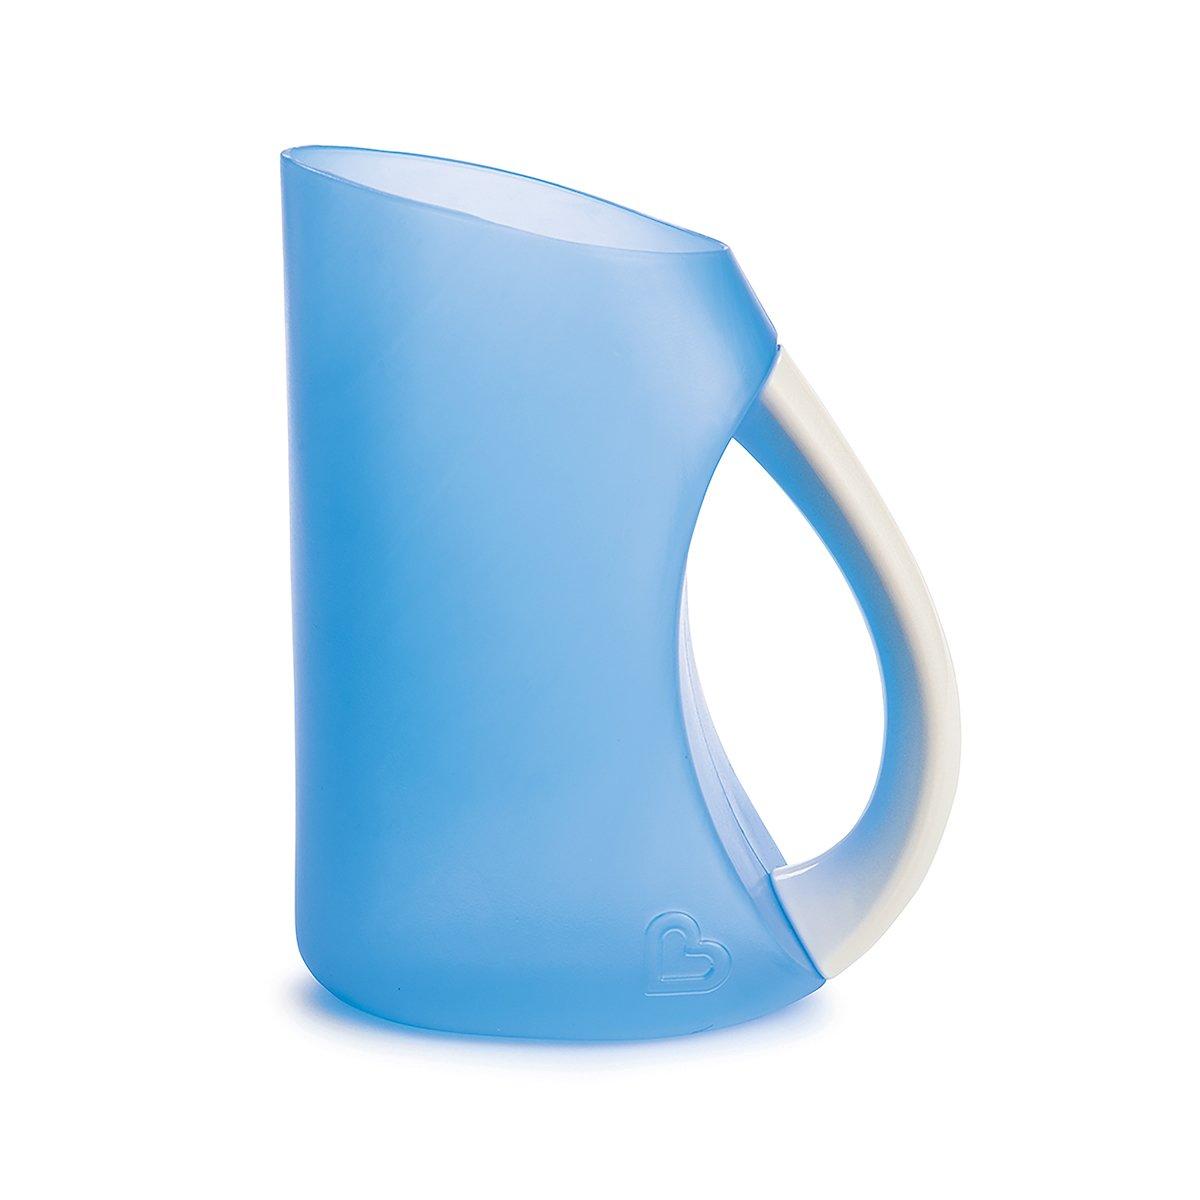 Munchkin - 011336 - Dispositif de Rincage apres Shampooing - Shampoo Rinser 01133601